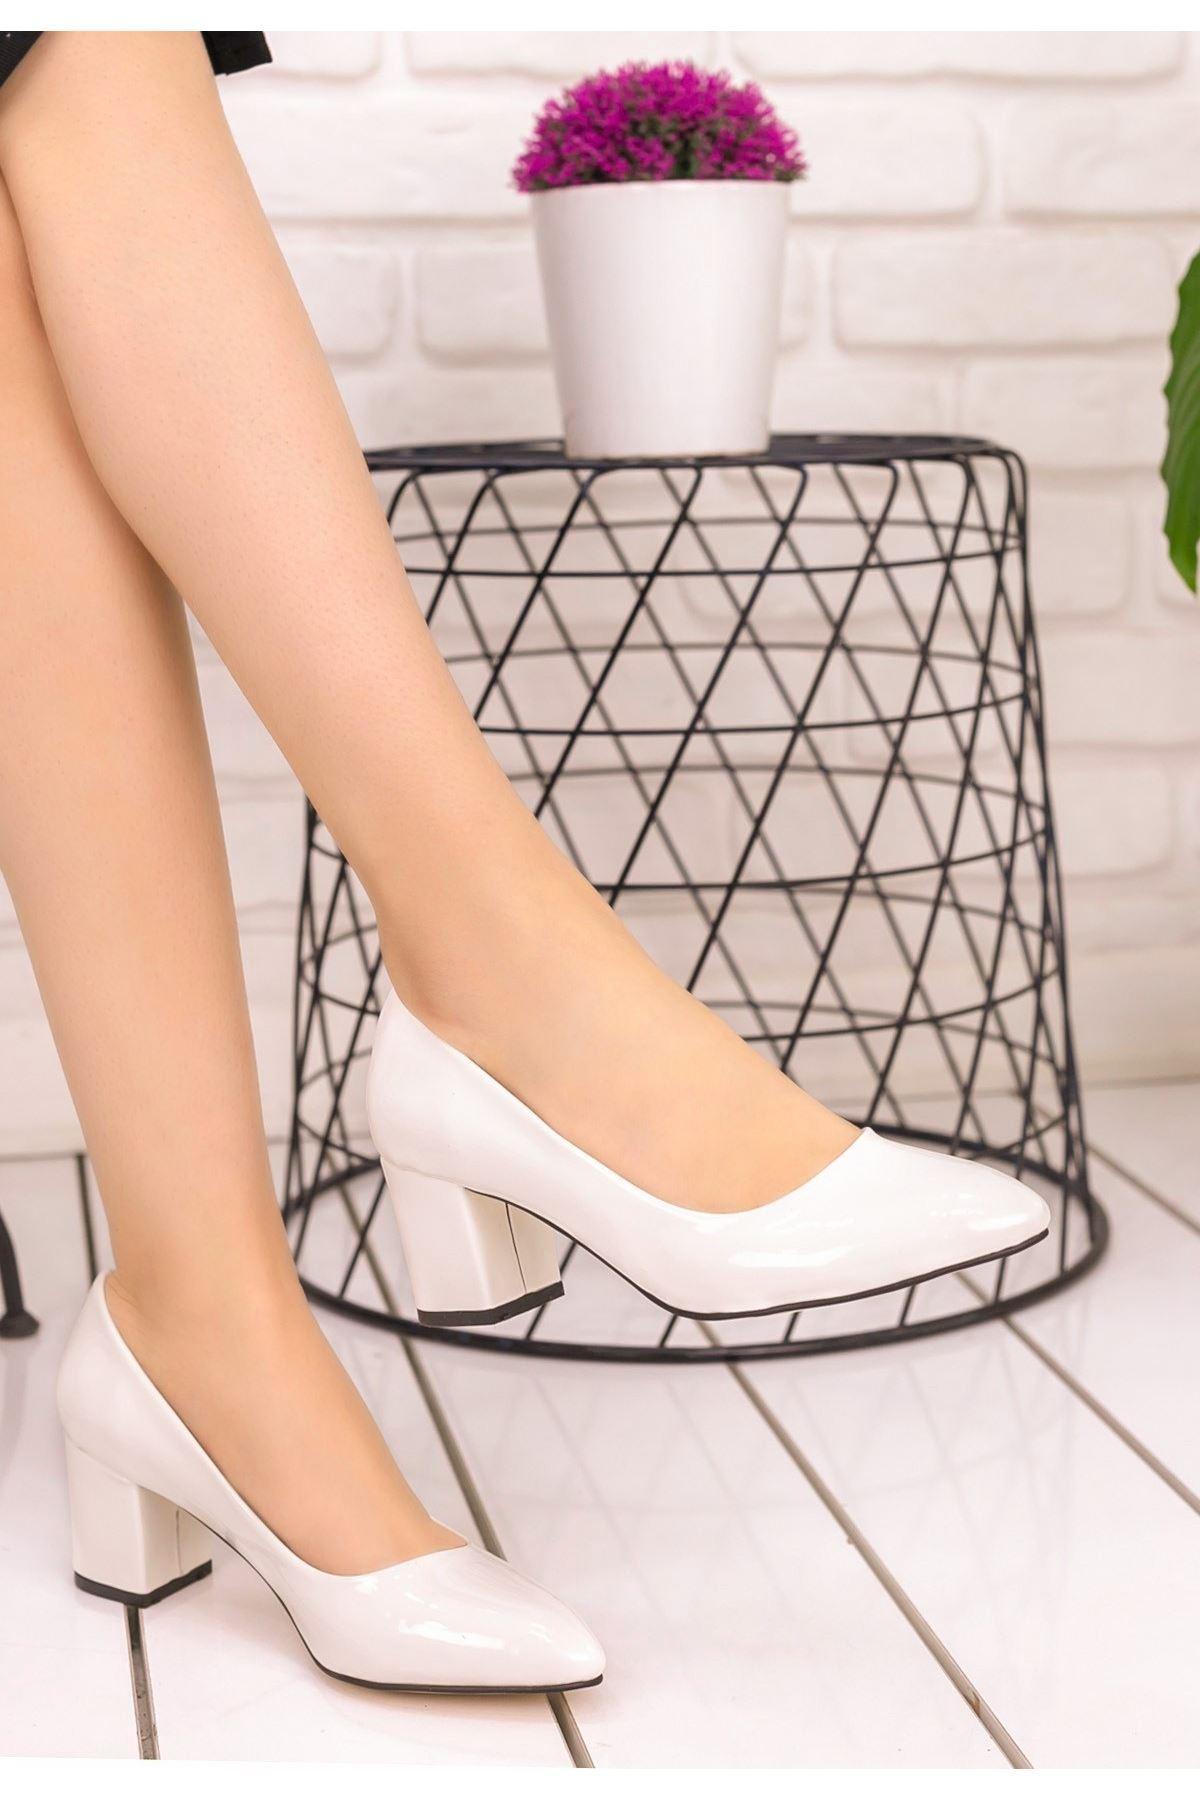 Lehisa Beyaz Rugan Topuklu Ayakkabı